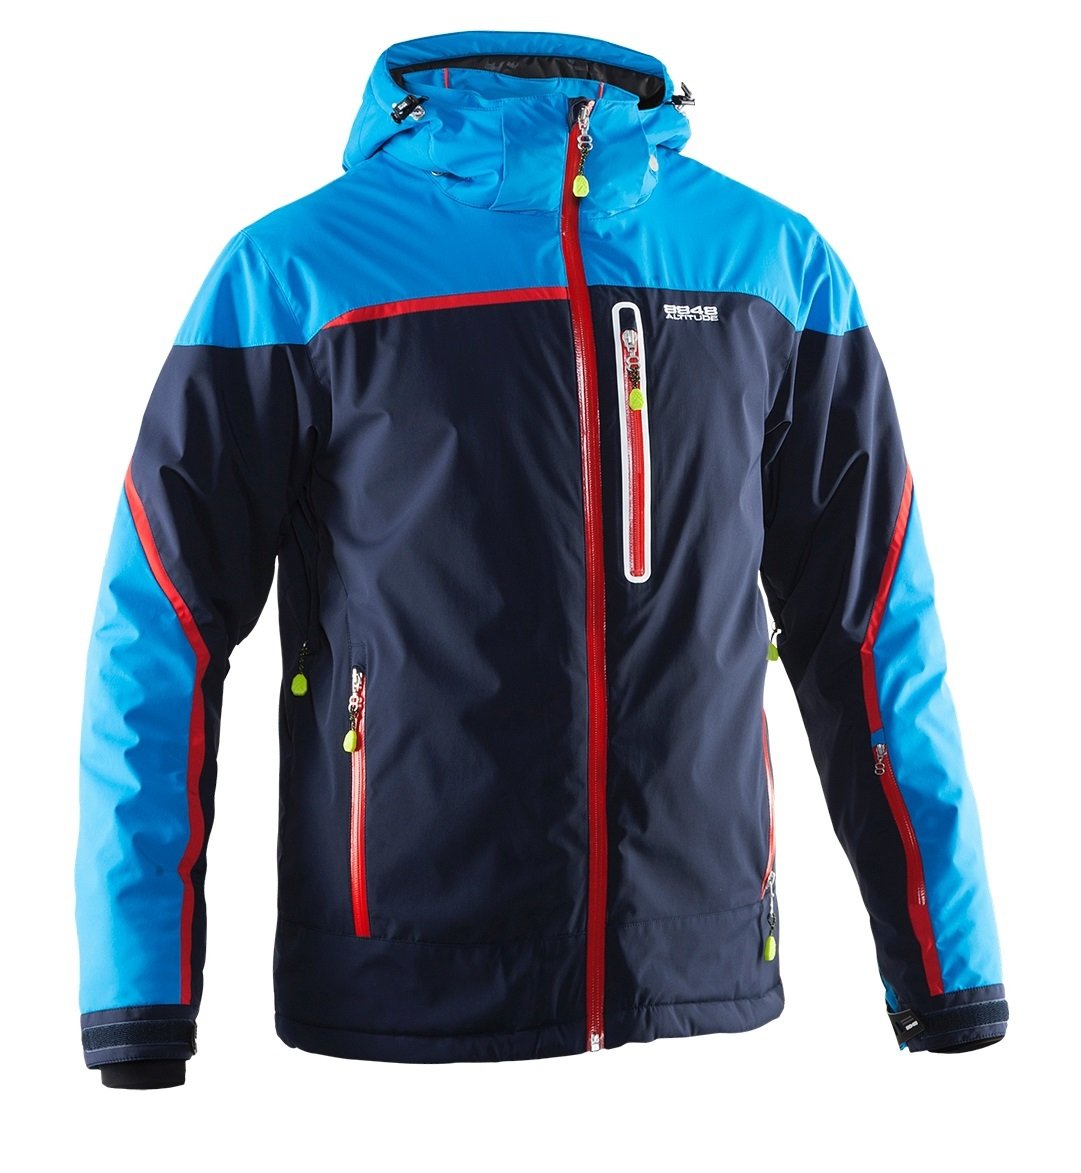 Мужская горнолыжная куртка 8848 Altitude Iron Softshell (701815)